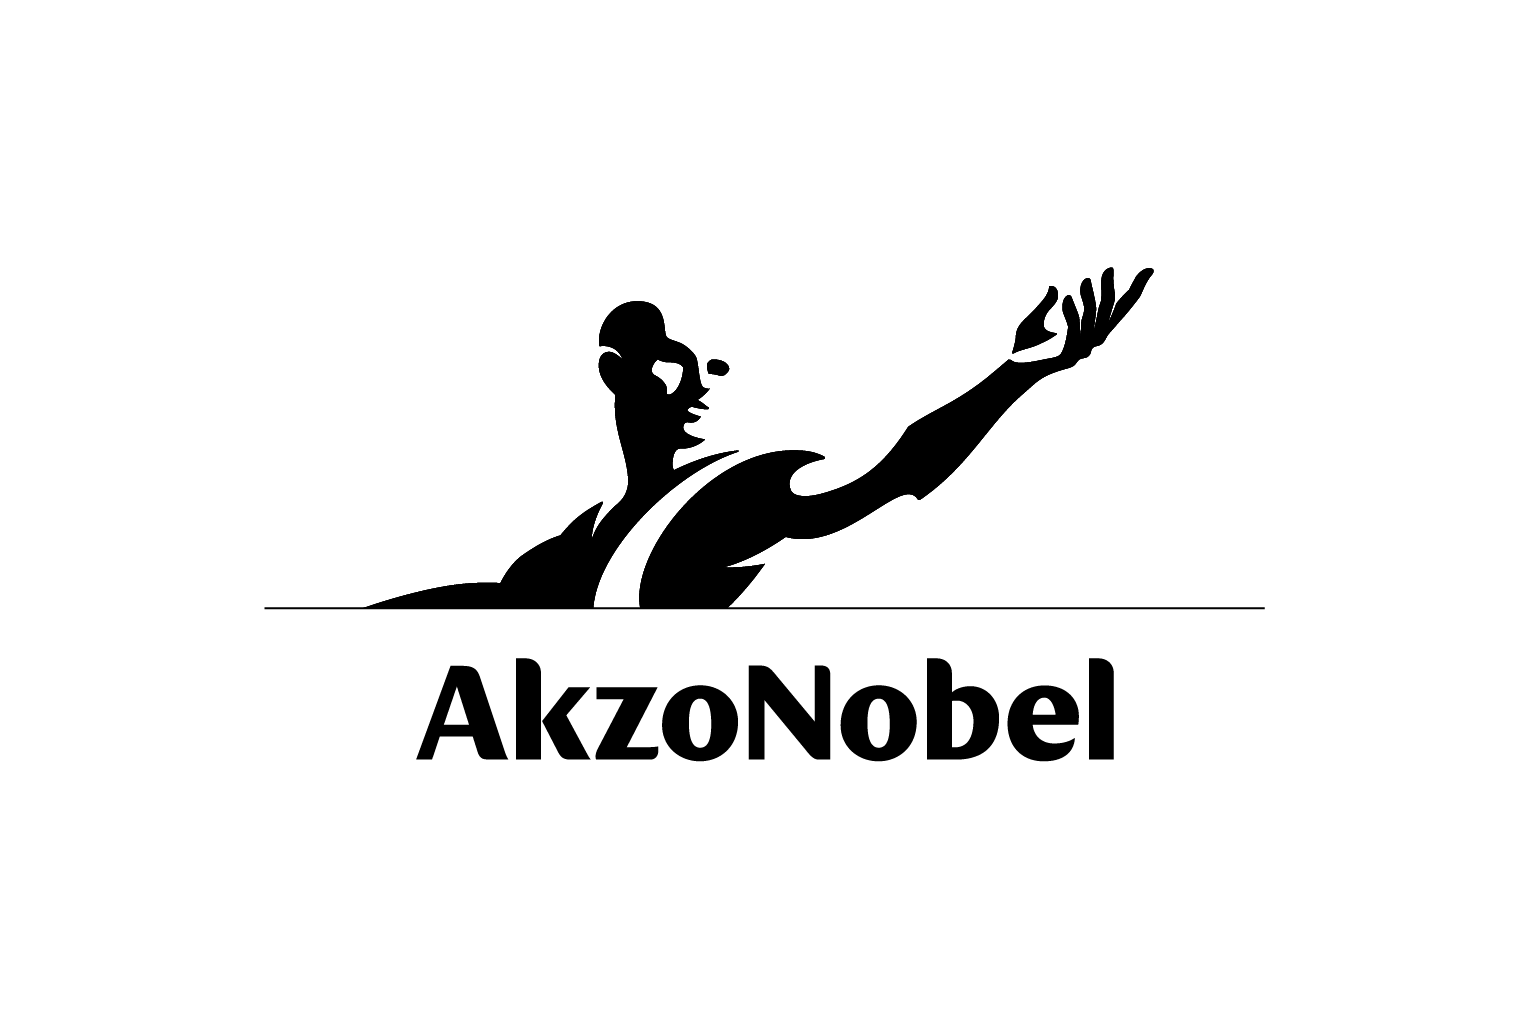 Logos_Noir-07.png